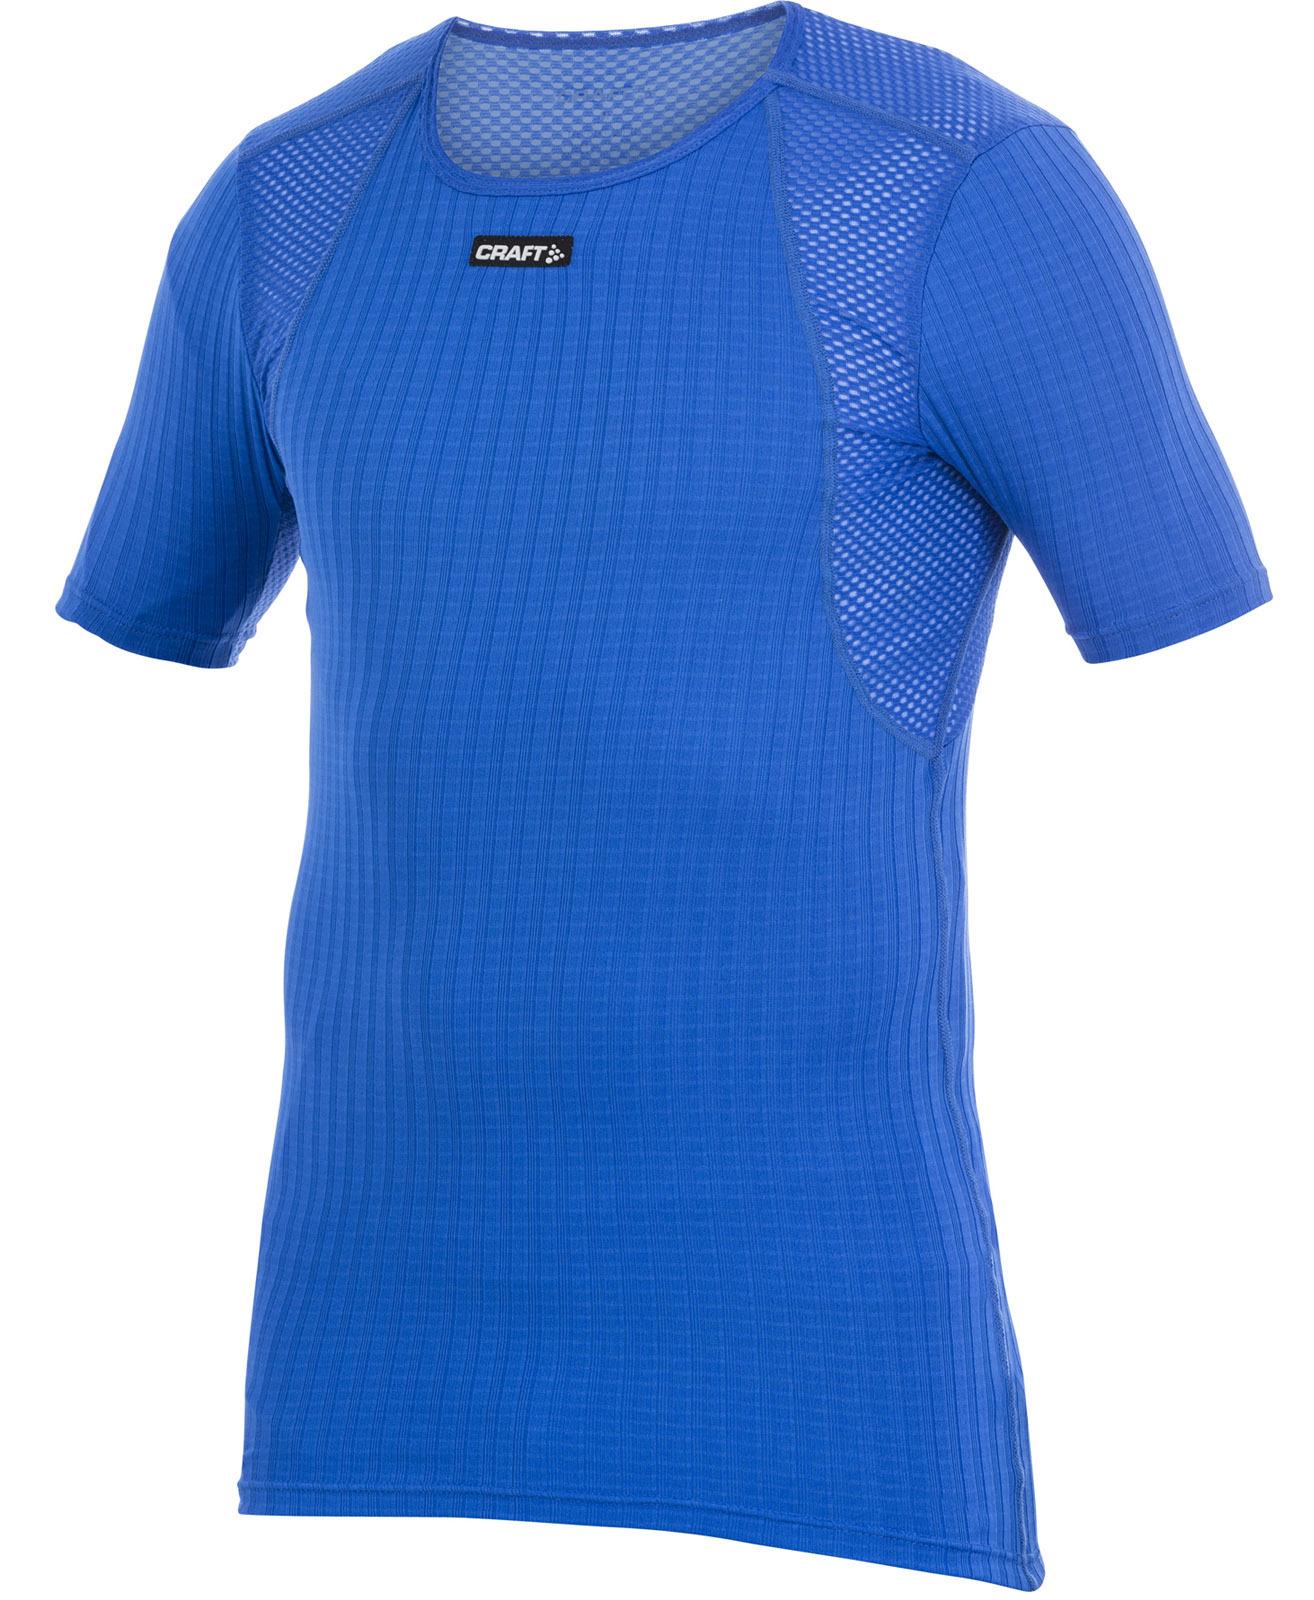 Мужская футболка Craft Active Extreme Concept (1901232-1345)